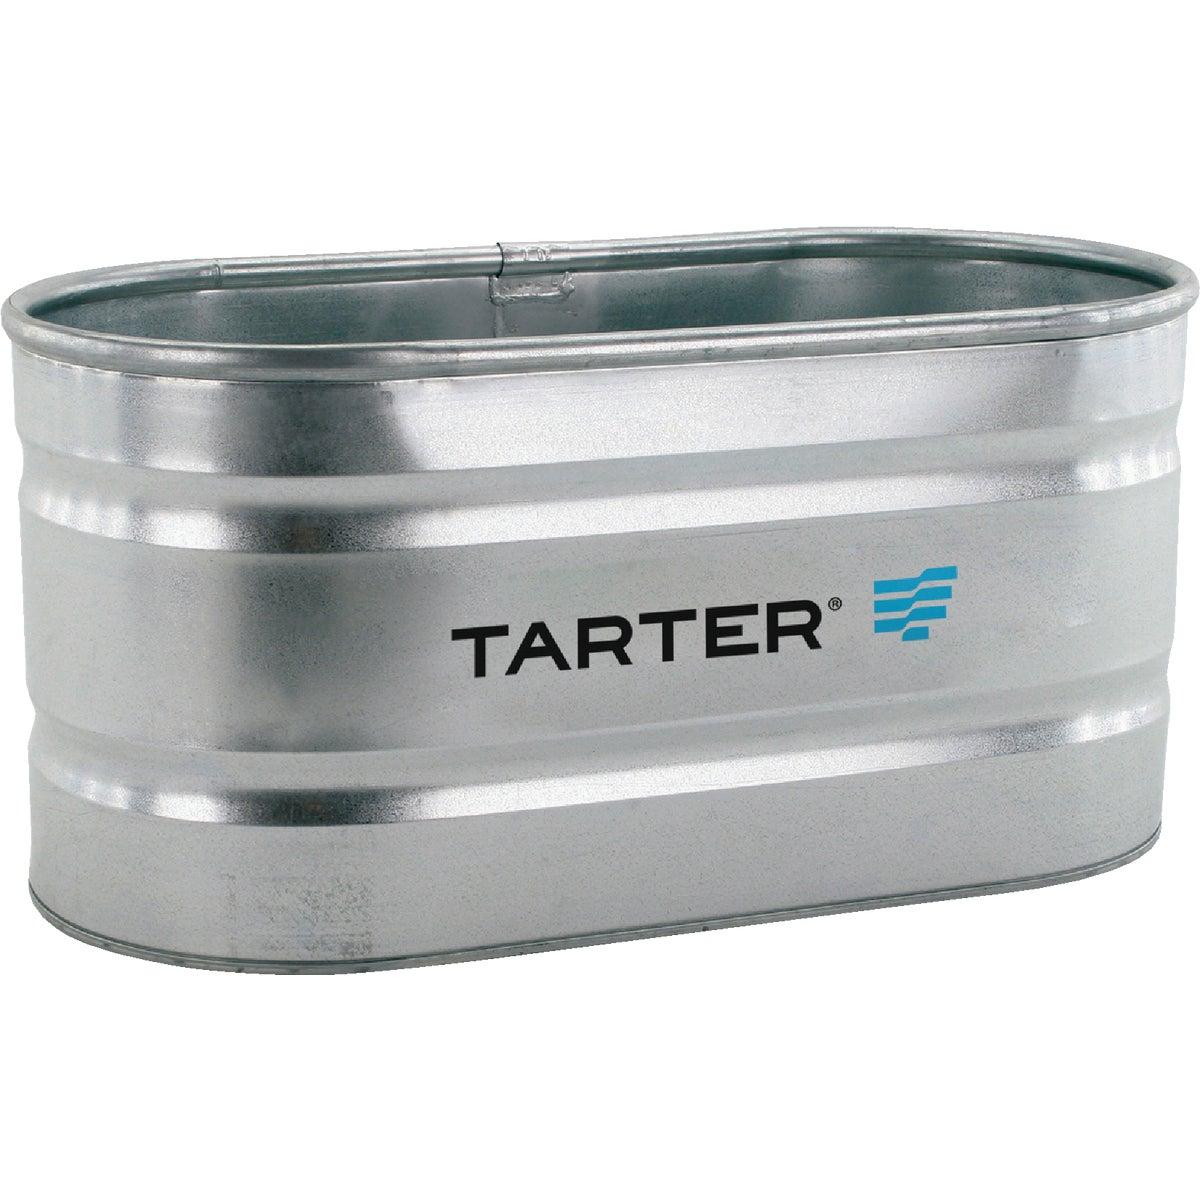 100GAL GLV WATER TANK - WT224 by Tarter Llc